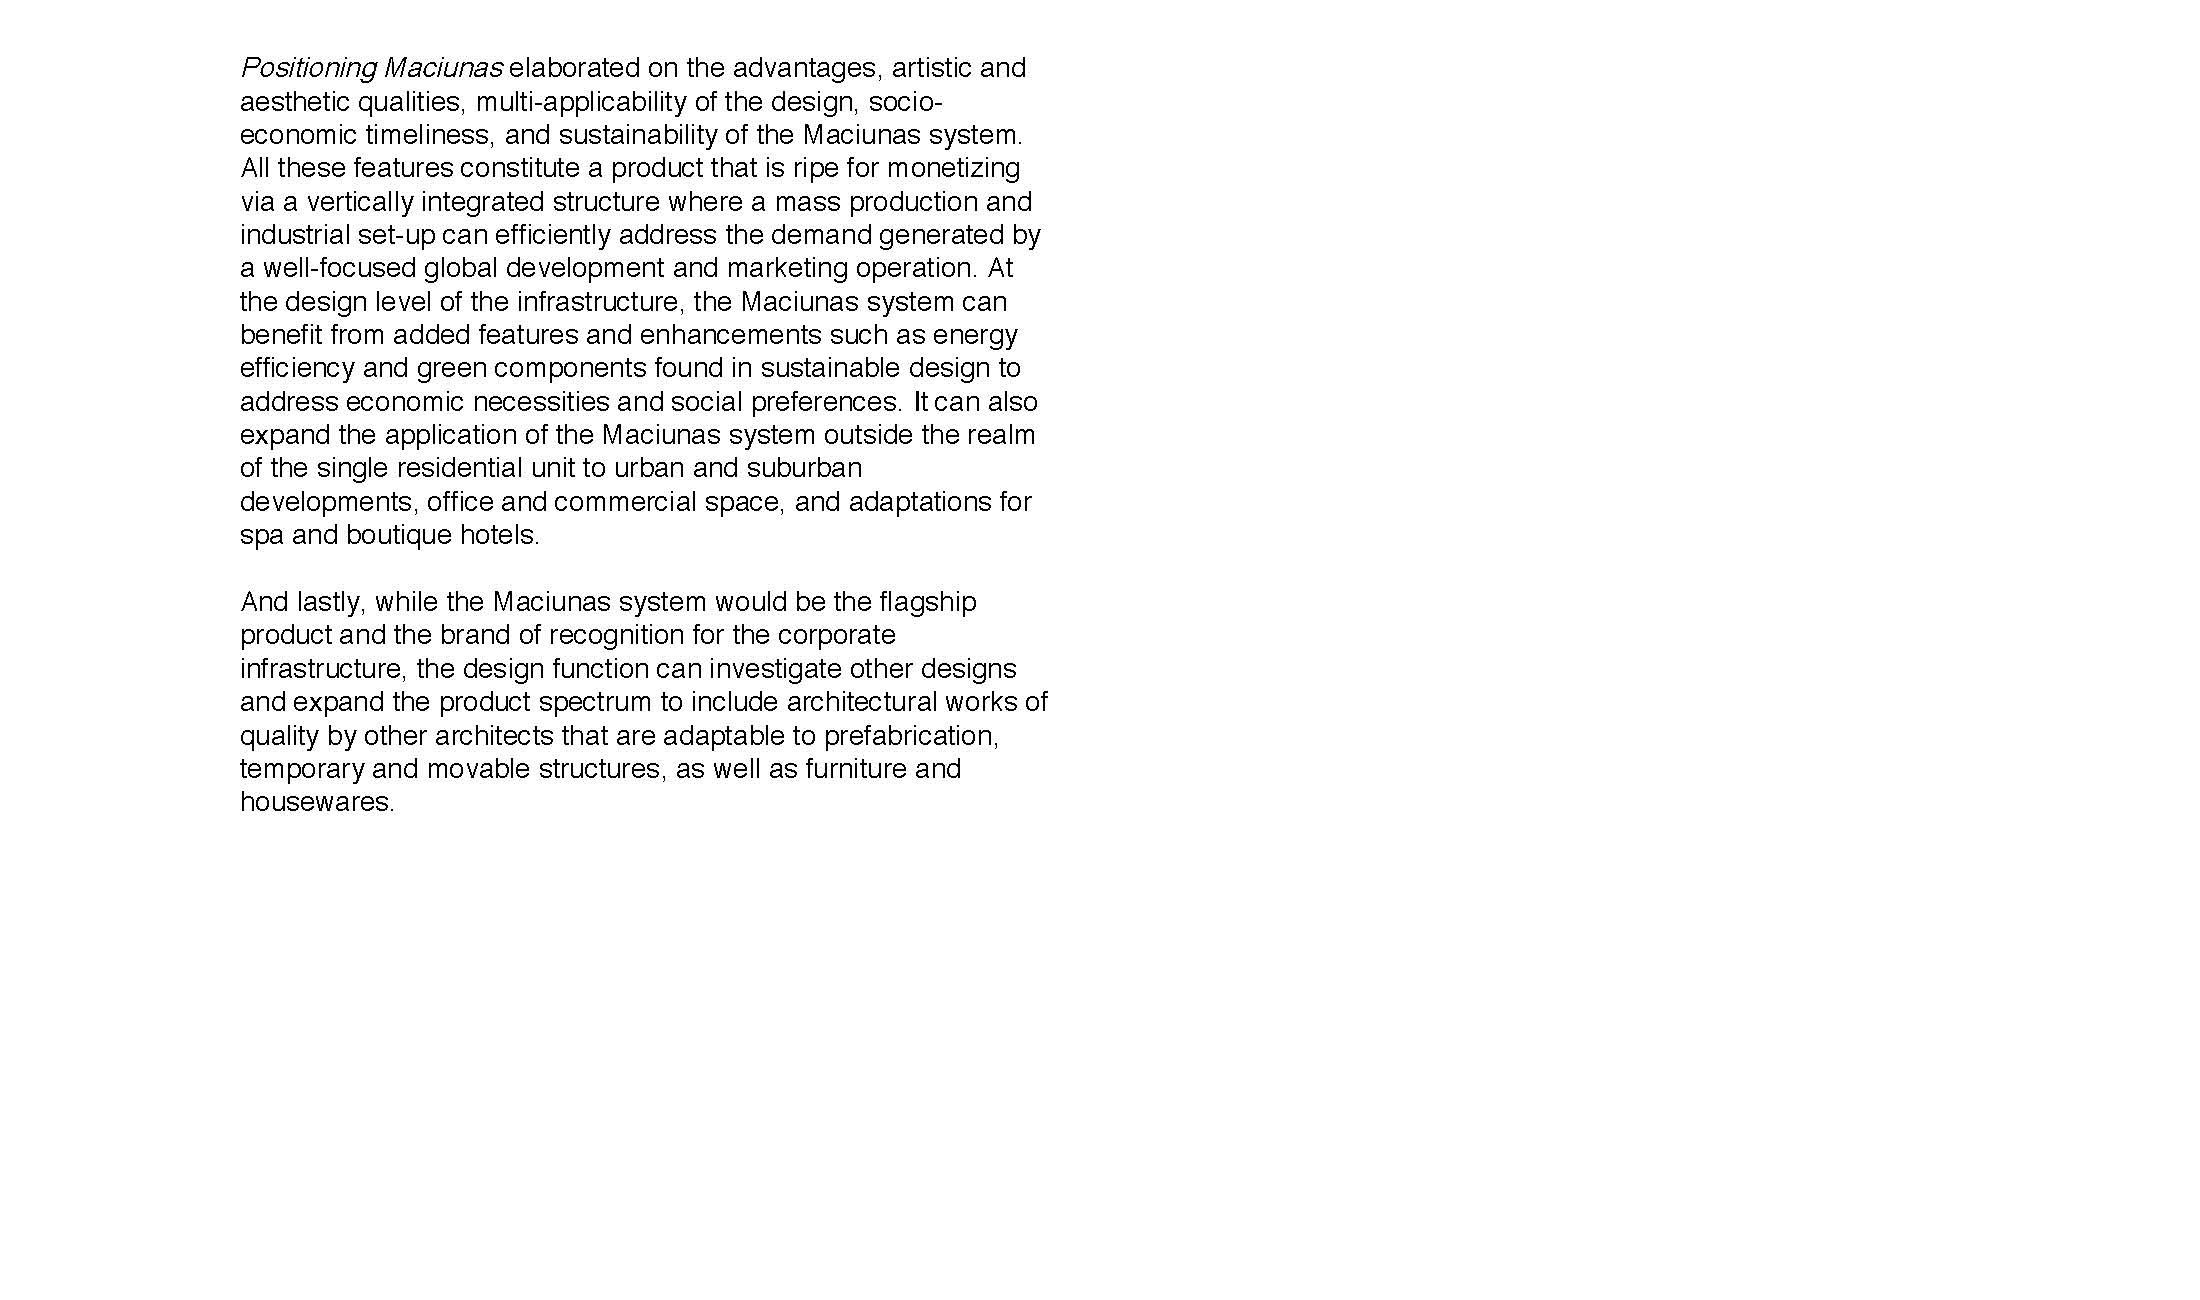 Maciunas Assessment Report 0509_Page_72.jpg